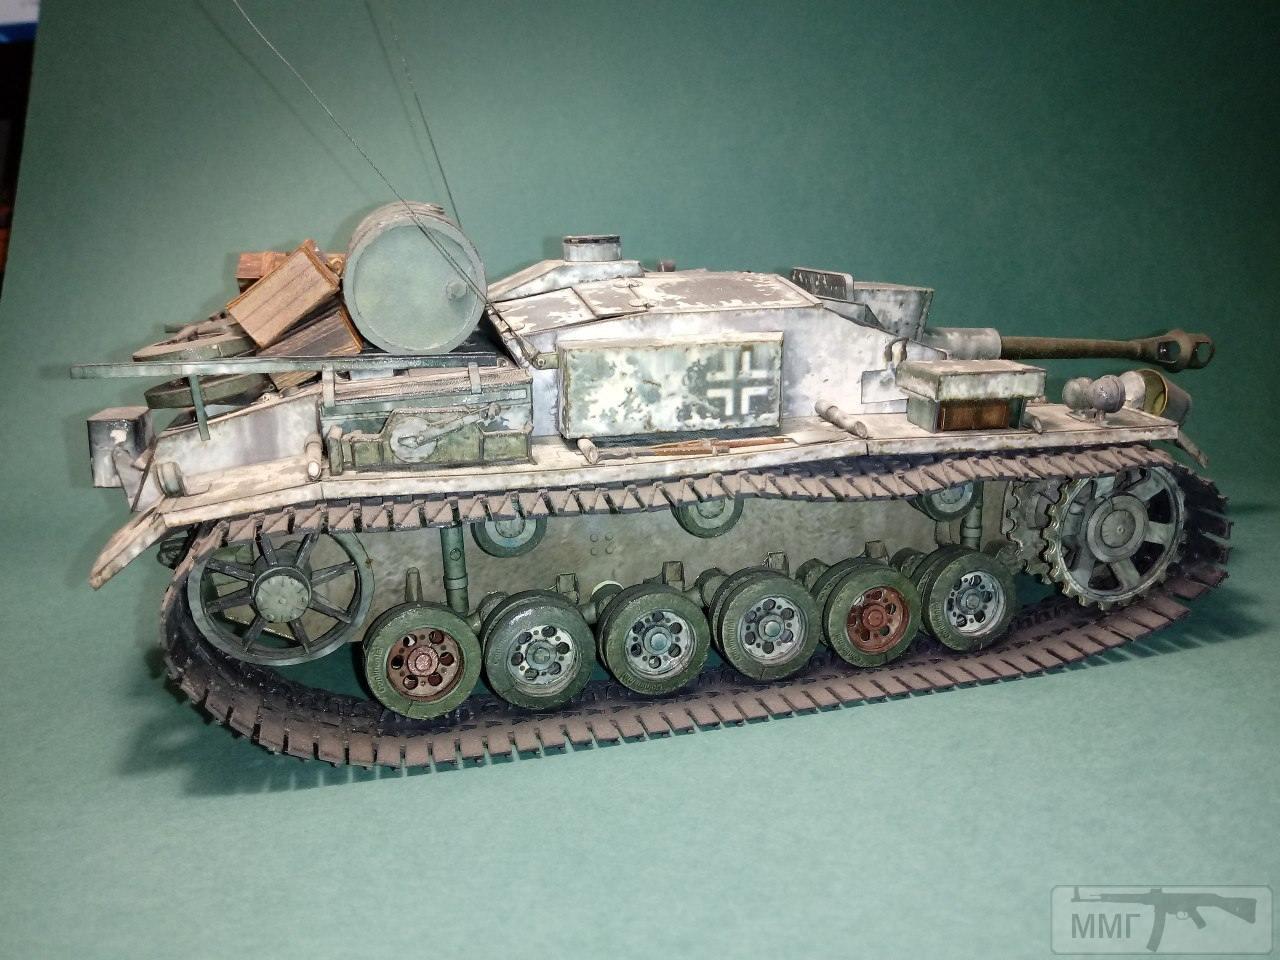 20406 - StuG III. 1/25. Бумага.